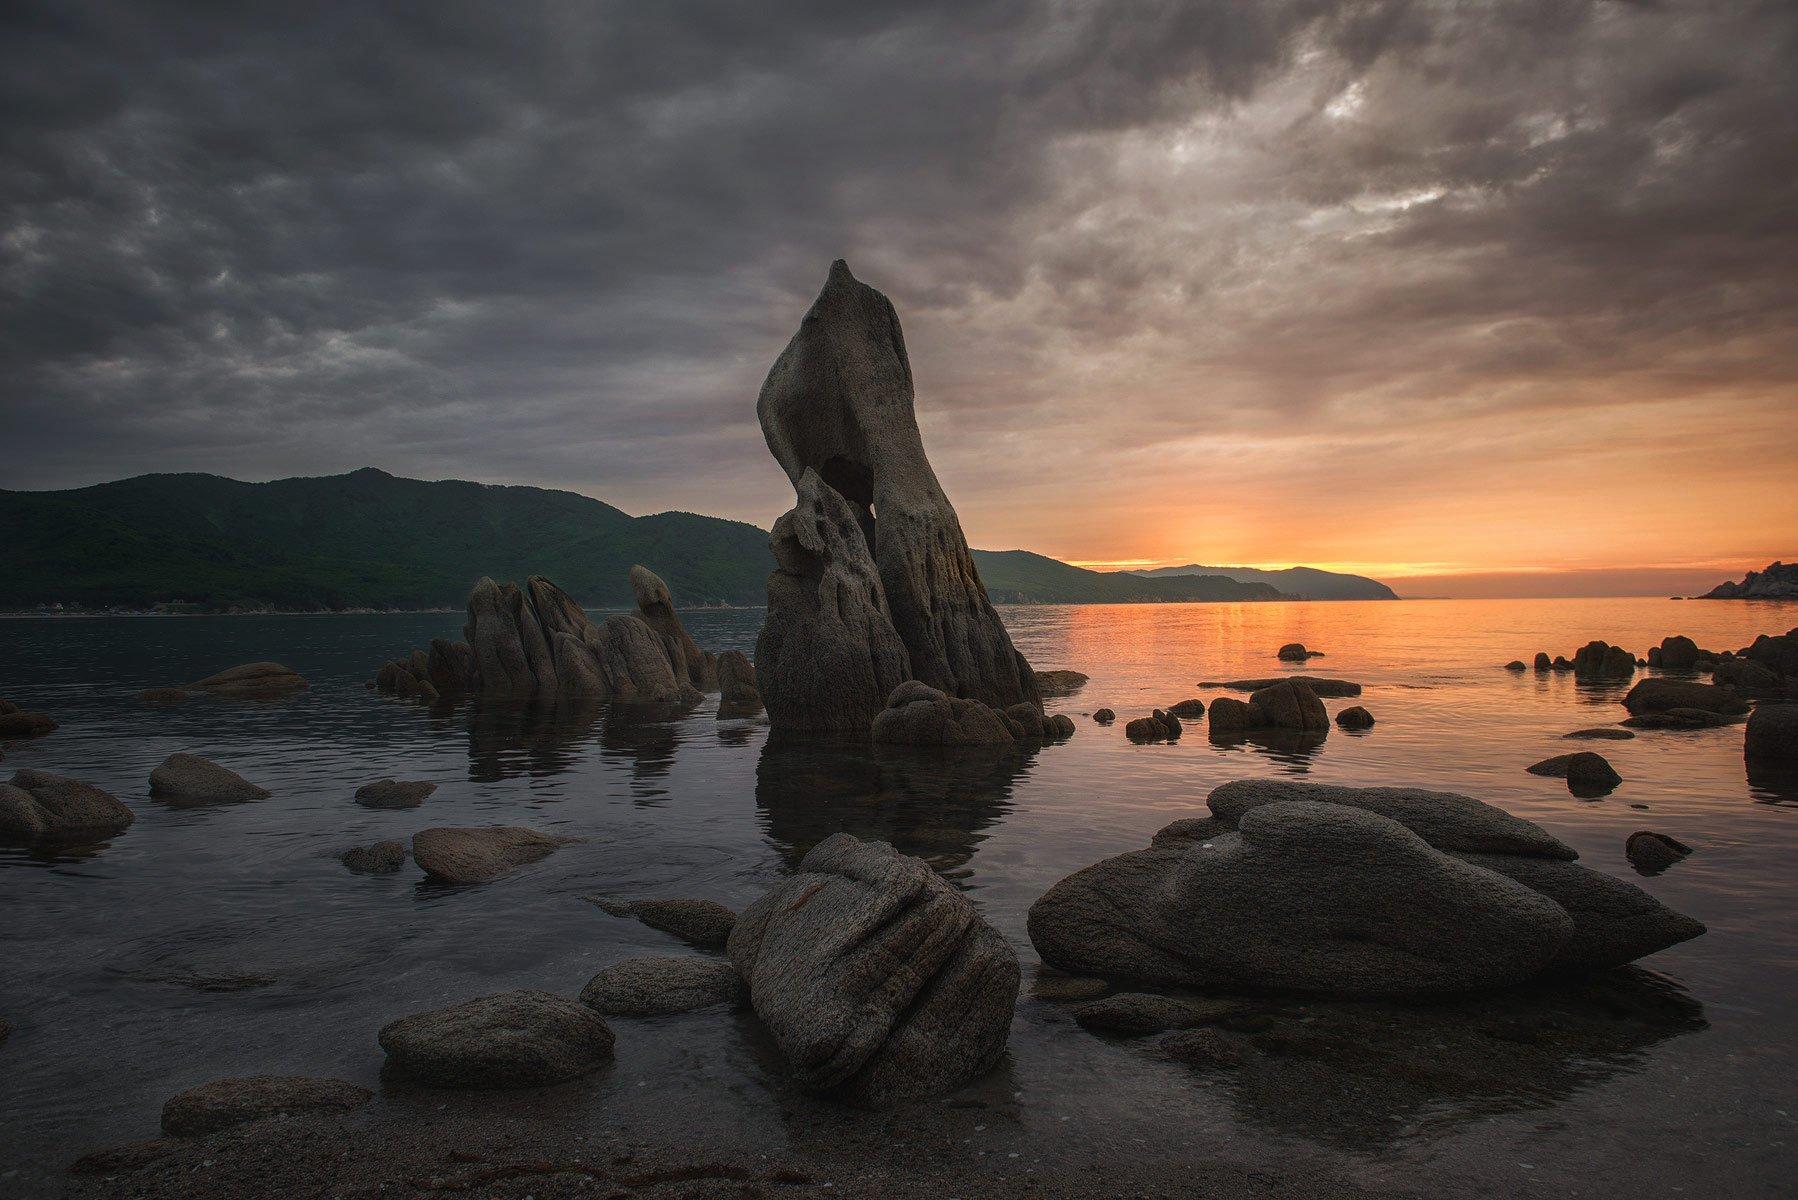 приморский край, море, солнце, рассвет, море, побережье, Сорокин Алексей